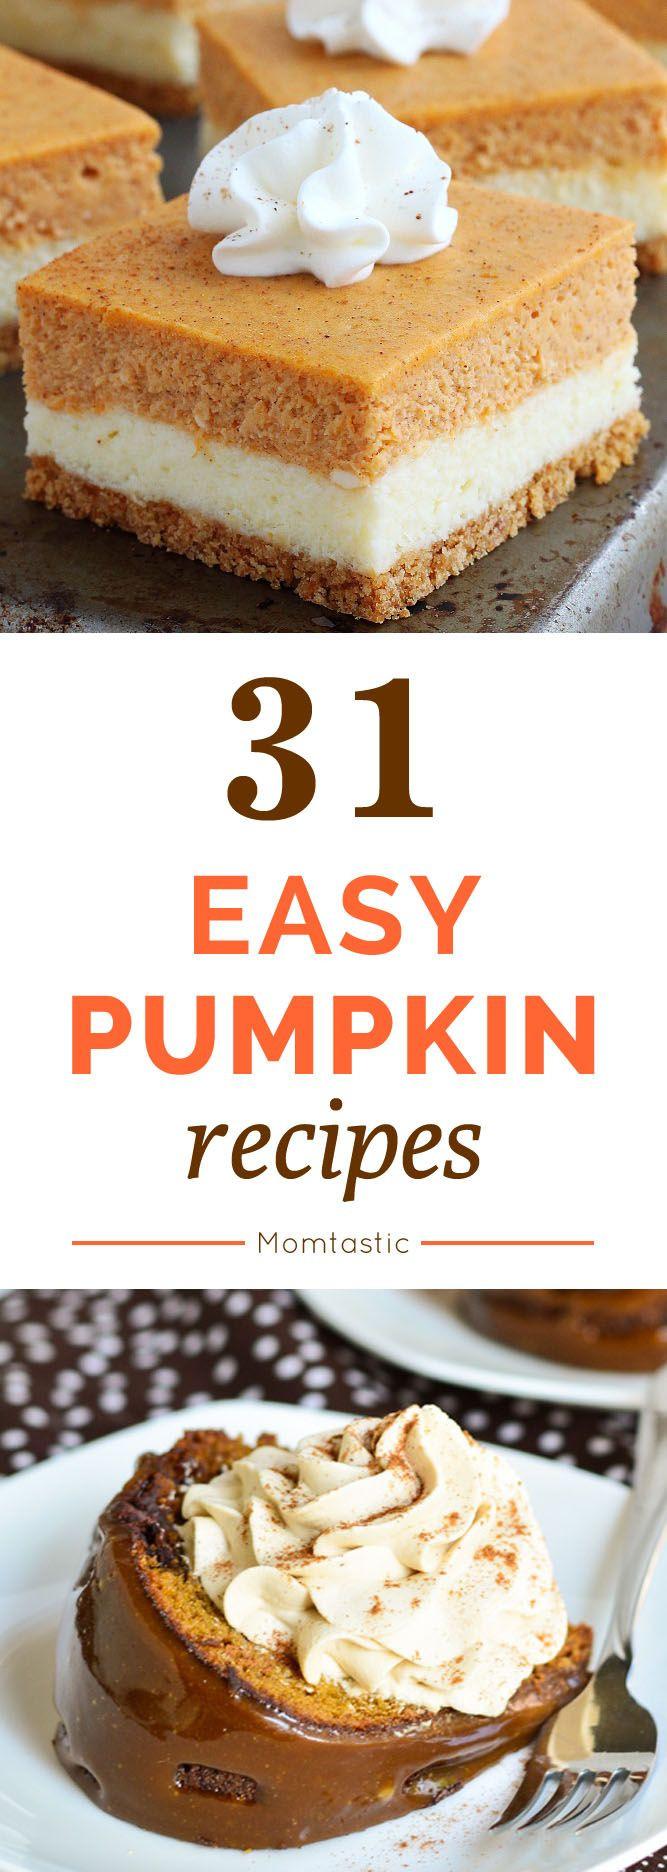 Easy Pumpkin Desserts  1000 images about Dessert Recipes on Pinterest